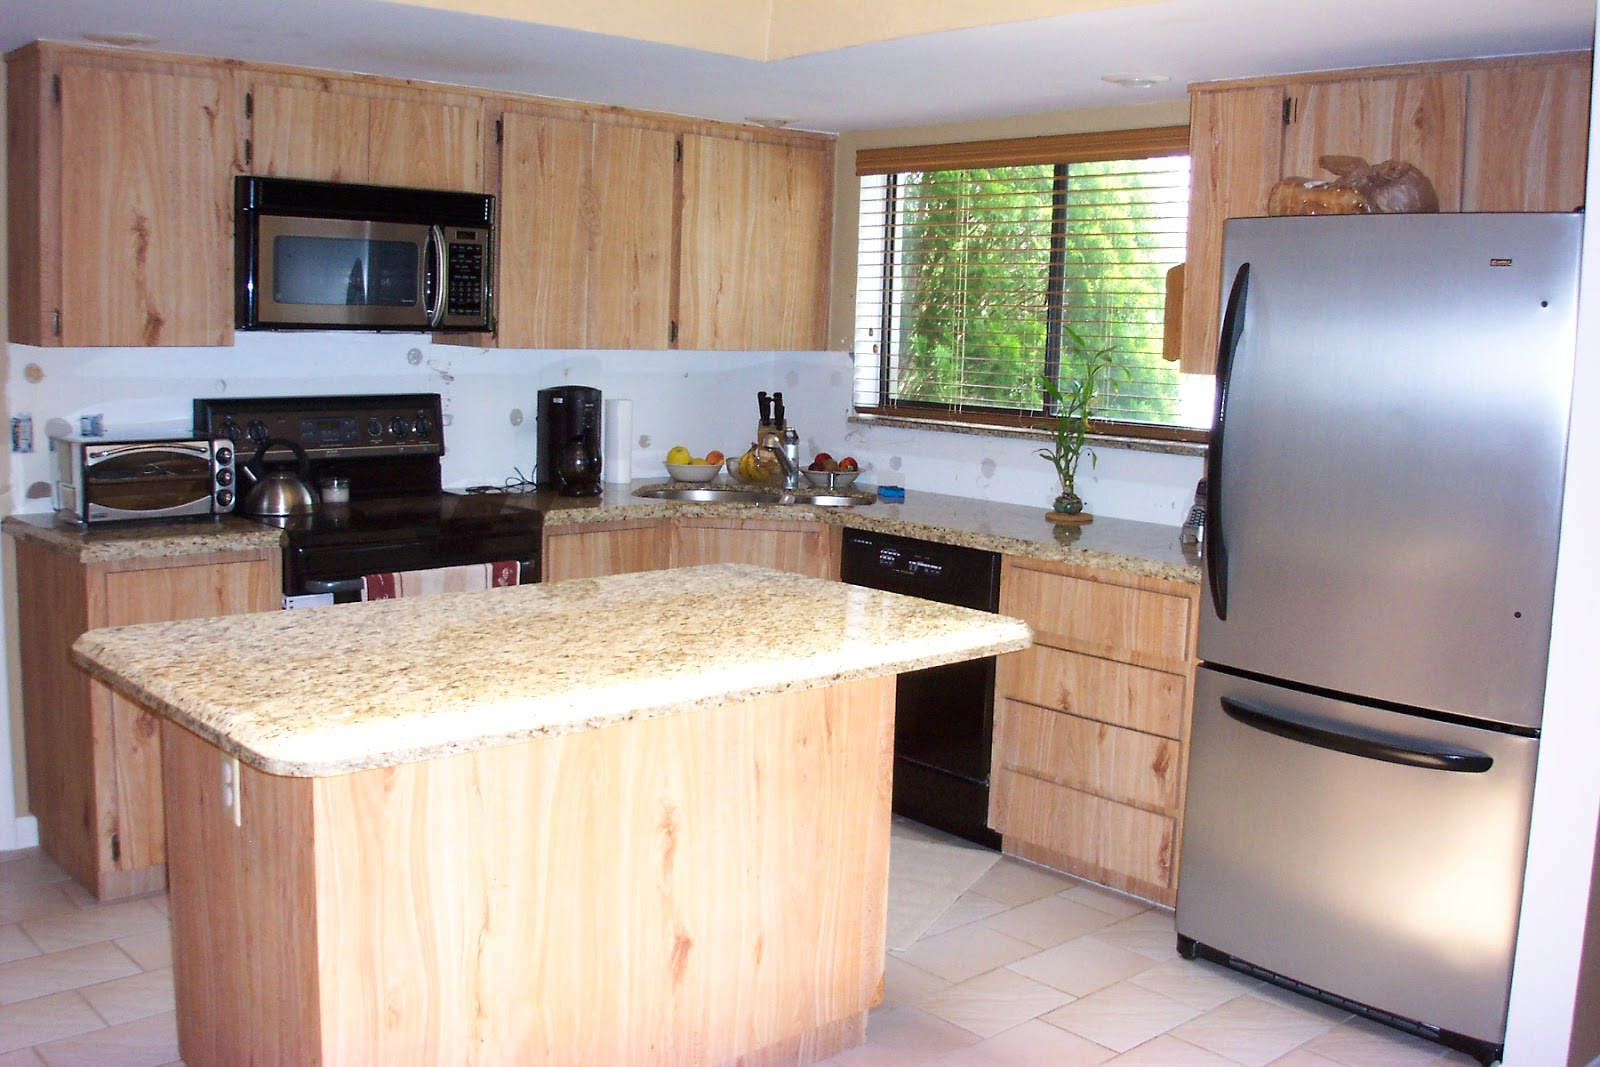 Attrayant U201cKitchen Refacing U201d Cabinet Refacing U201cRefacing U201cCabinets Refacingu201d Resurface  Resurfacing Reface Refacing Relaminate Laminate Kitchen Remodeling Remodel  ...